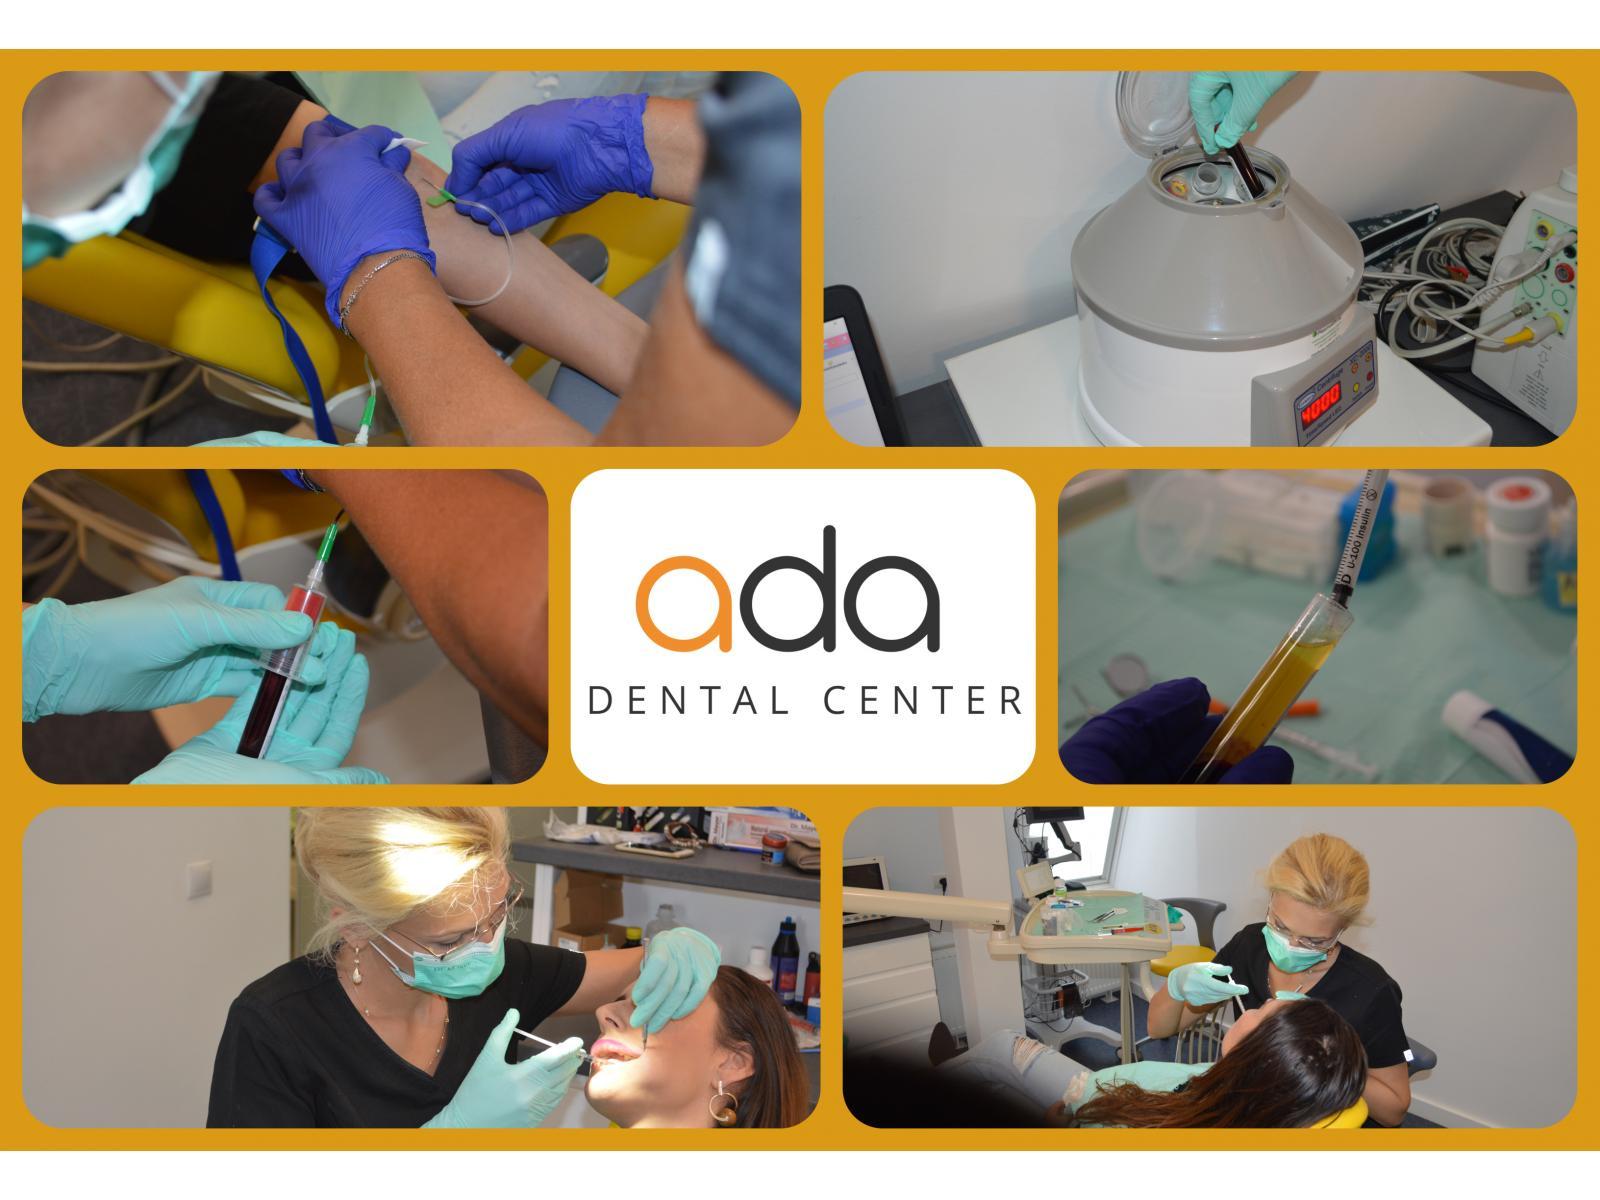 Ada Dental Center - Ada_dental_plasmo.jpg